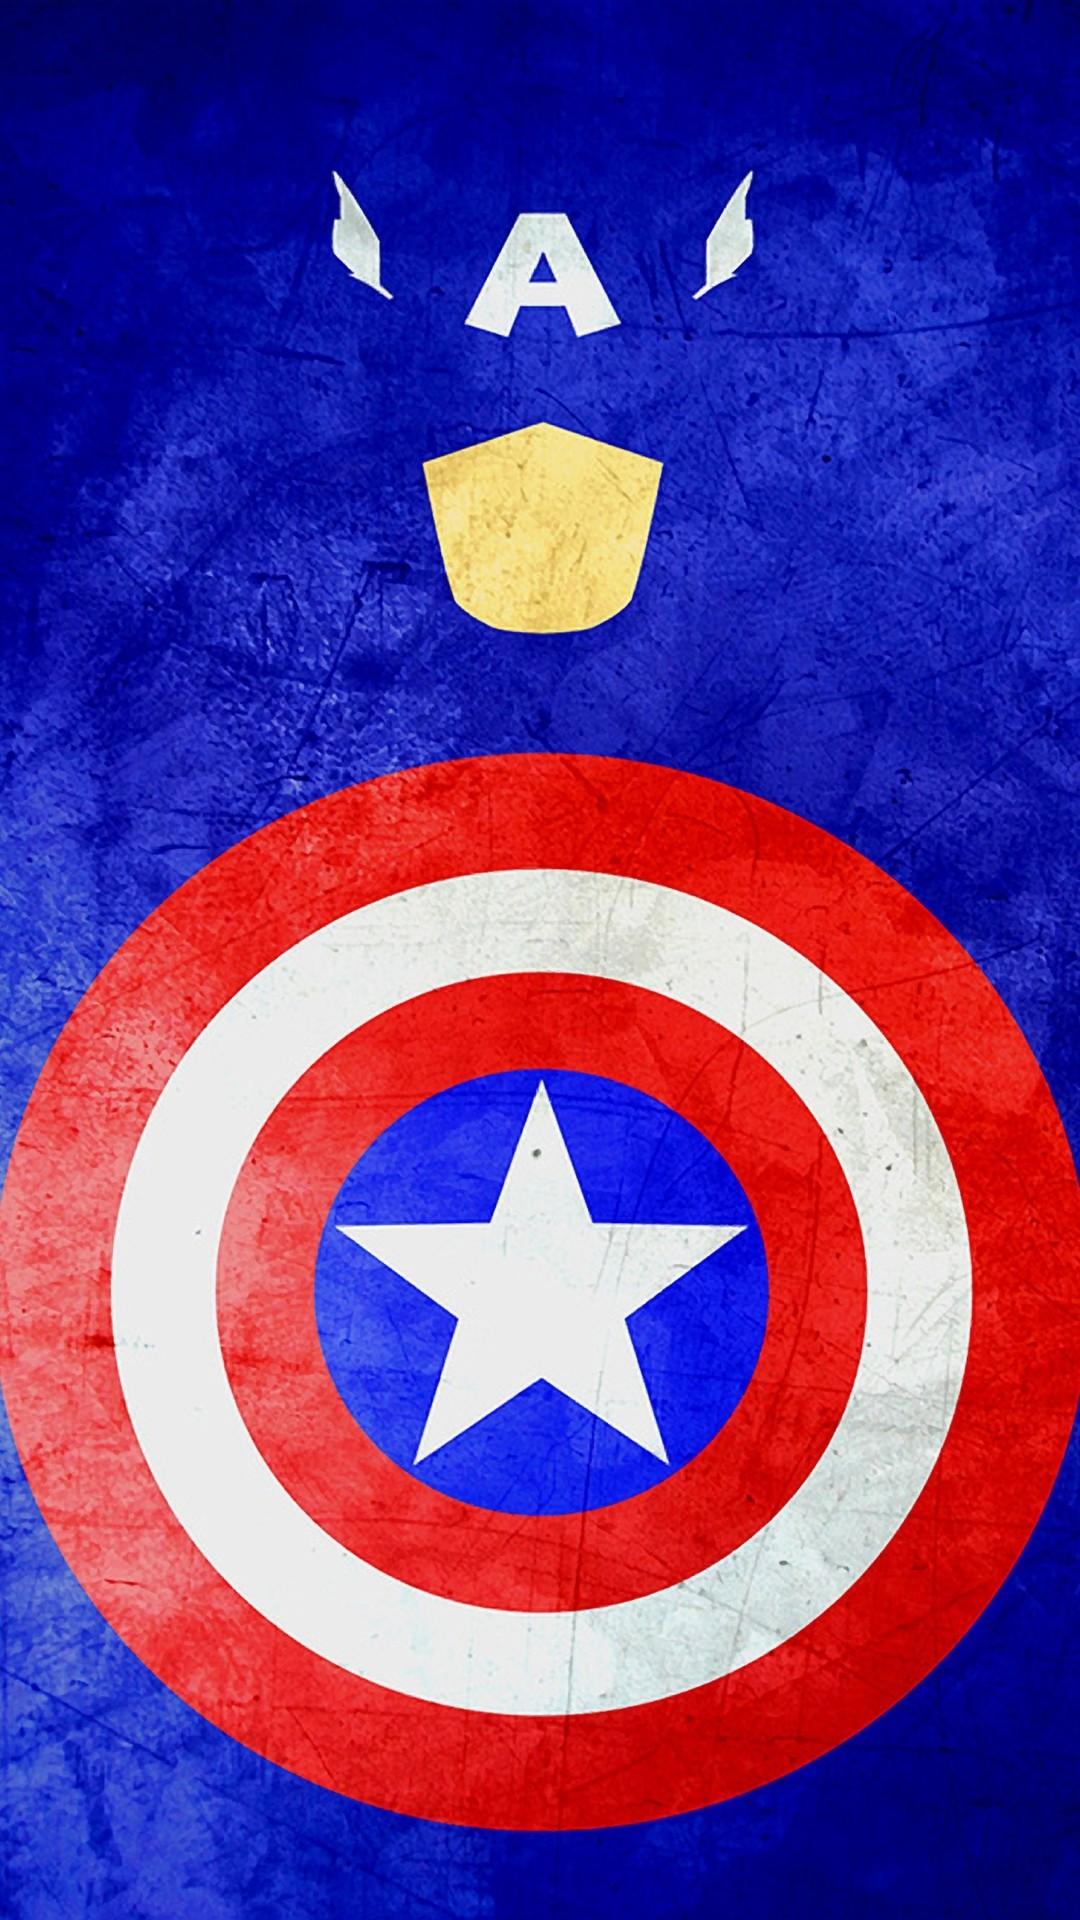 Captain America Iphone Wallpaper #captainamericaiphonewallpaper